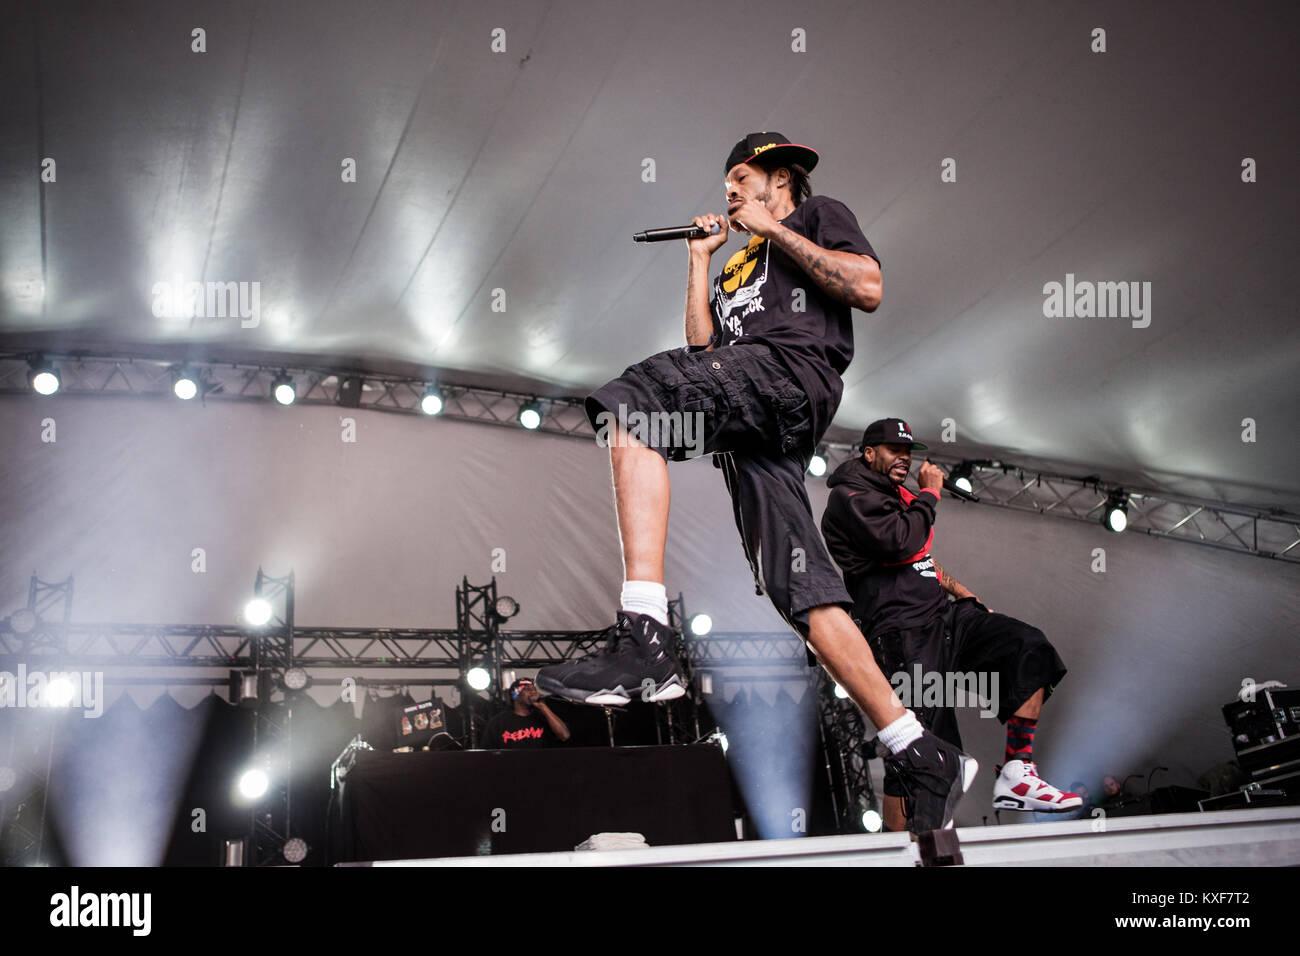 The American rap and hip hop duo Method Man & Redman performs a live concert at Vanguard Festival 2014 in Copenhagen. Stock Photo